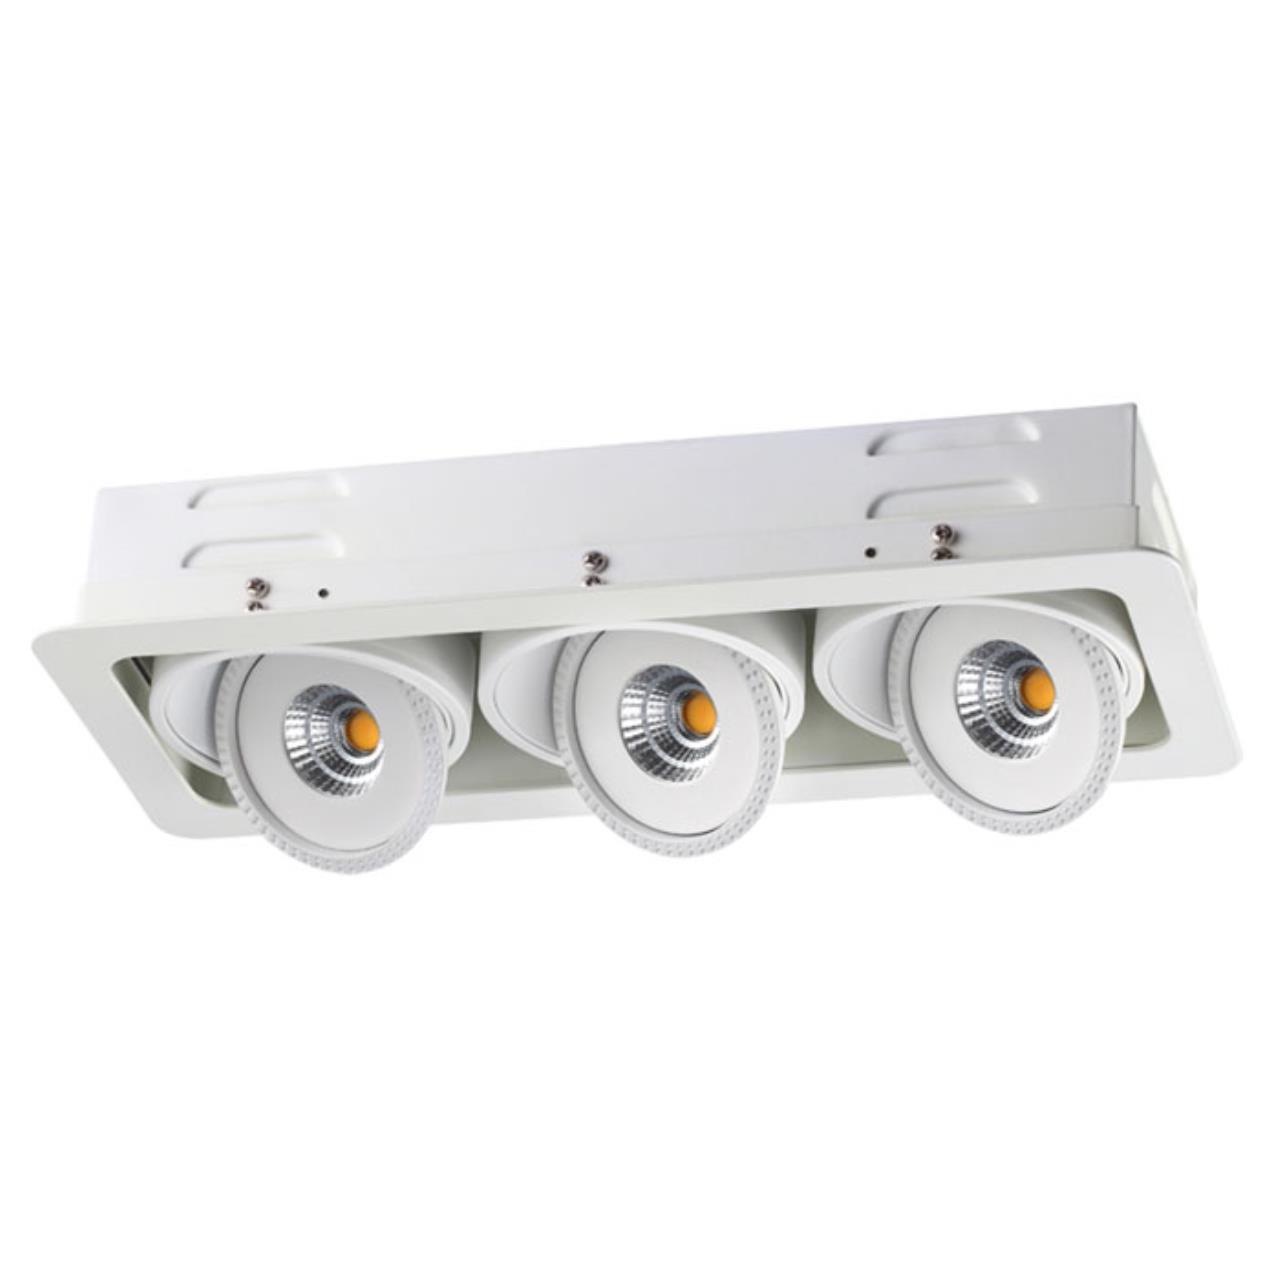 357582 SPOT NT18 081 белый Ввстраиваемый светильник IP20 LED 3000K 3*15W 85-265V GESSO